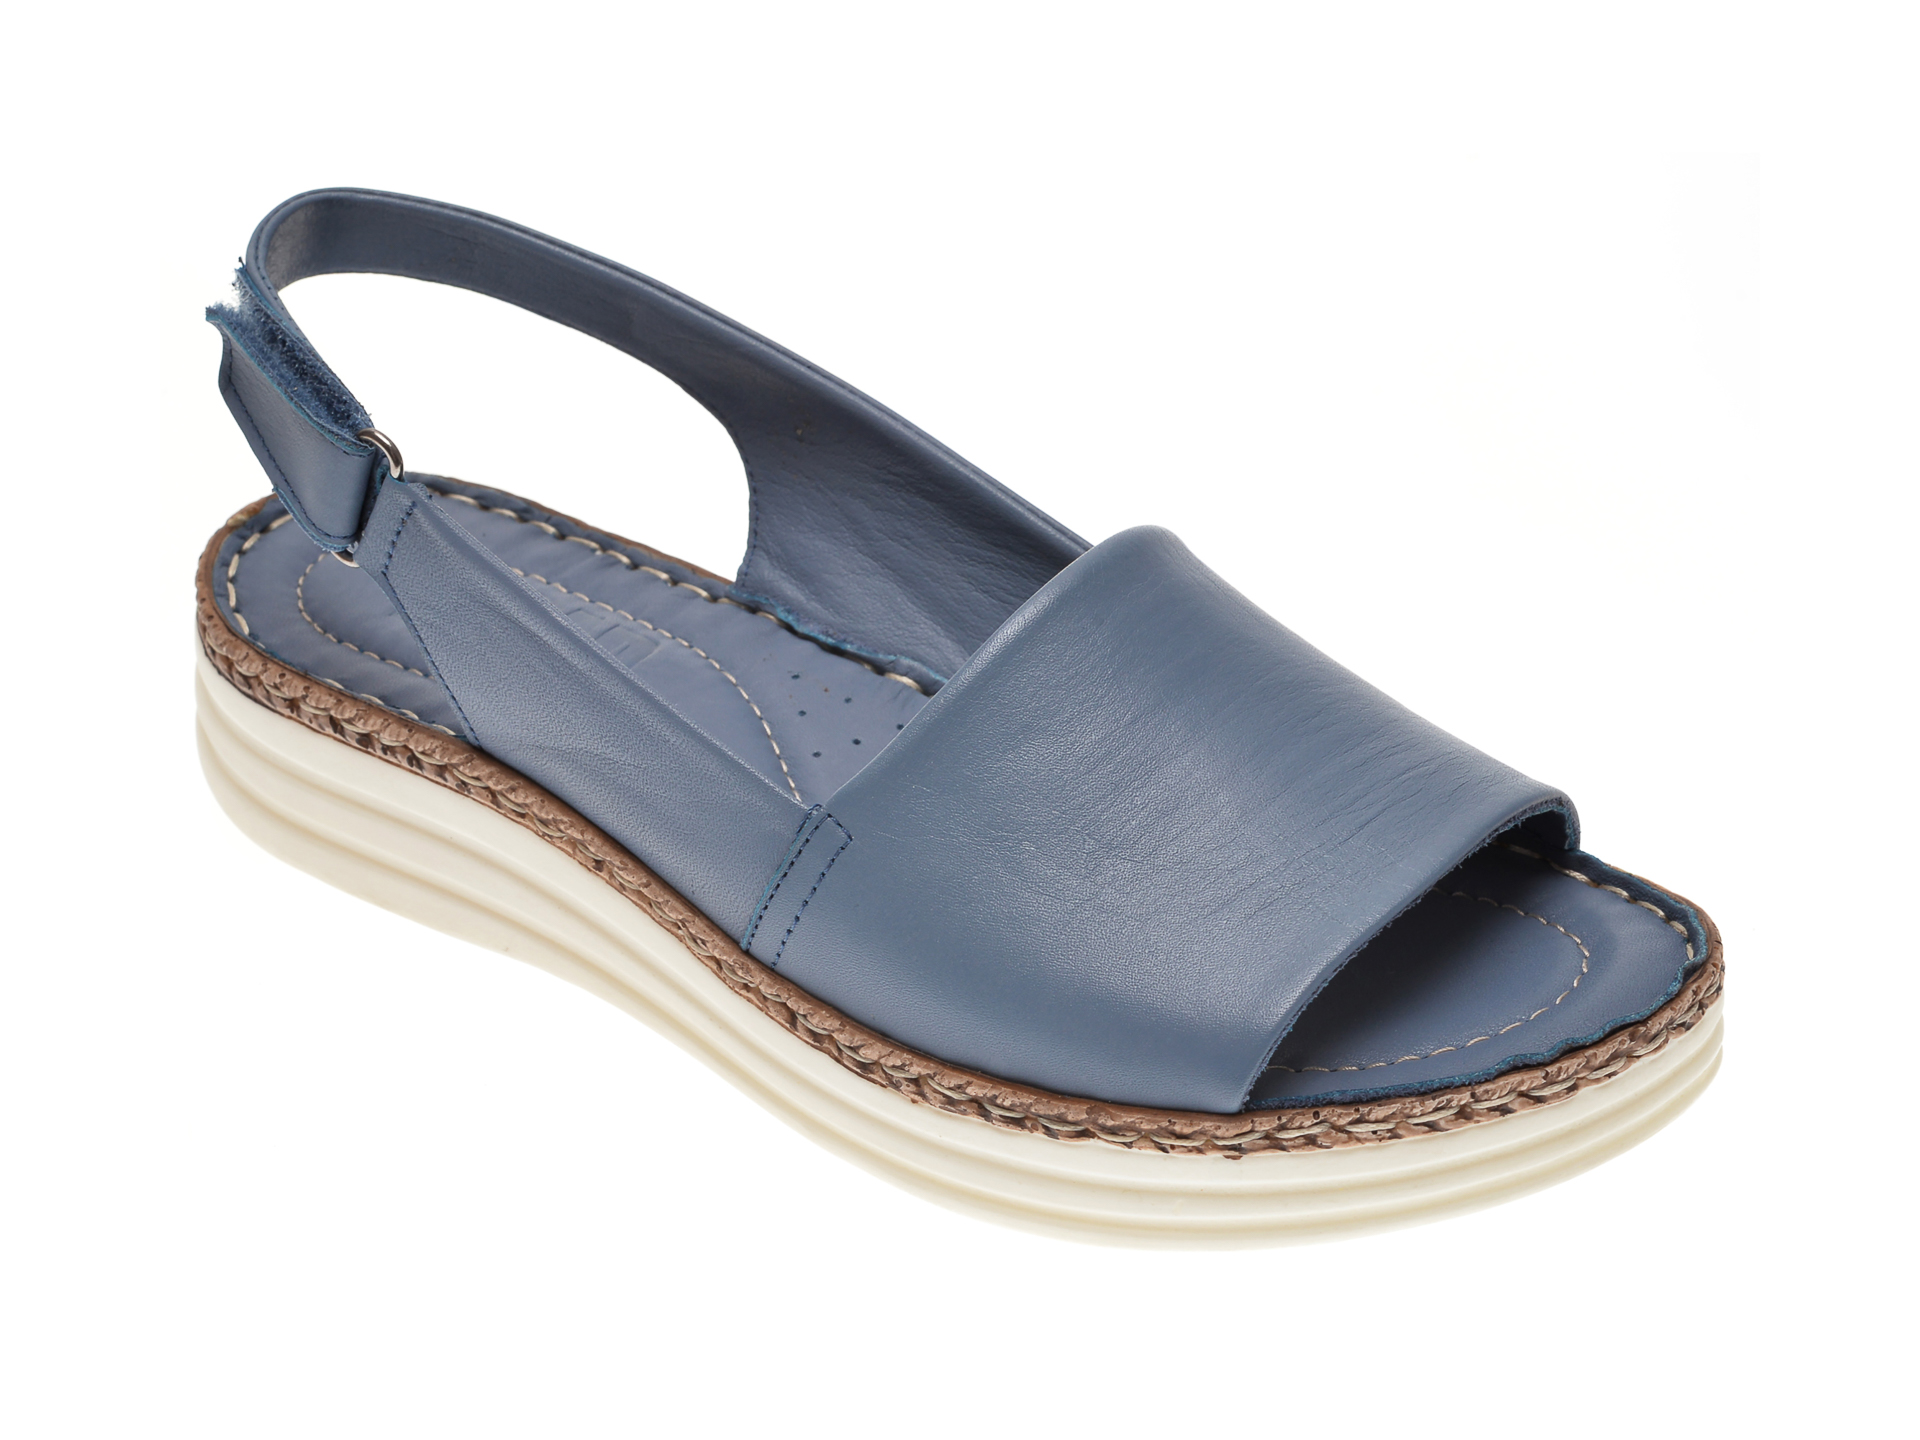 Sandale ON THE ROAD albastre, 580, din piele naturala